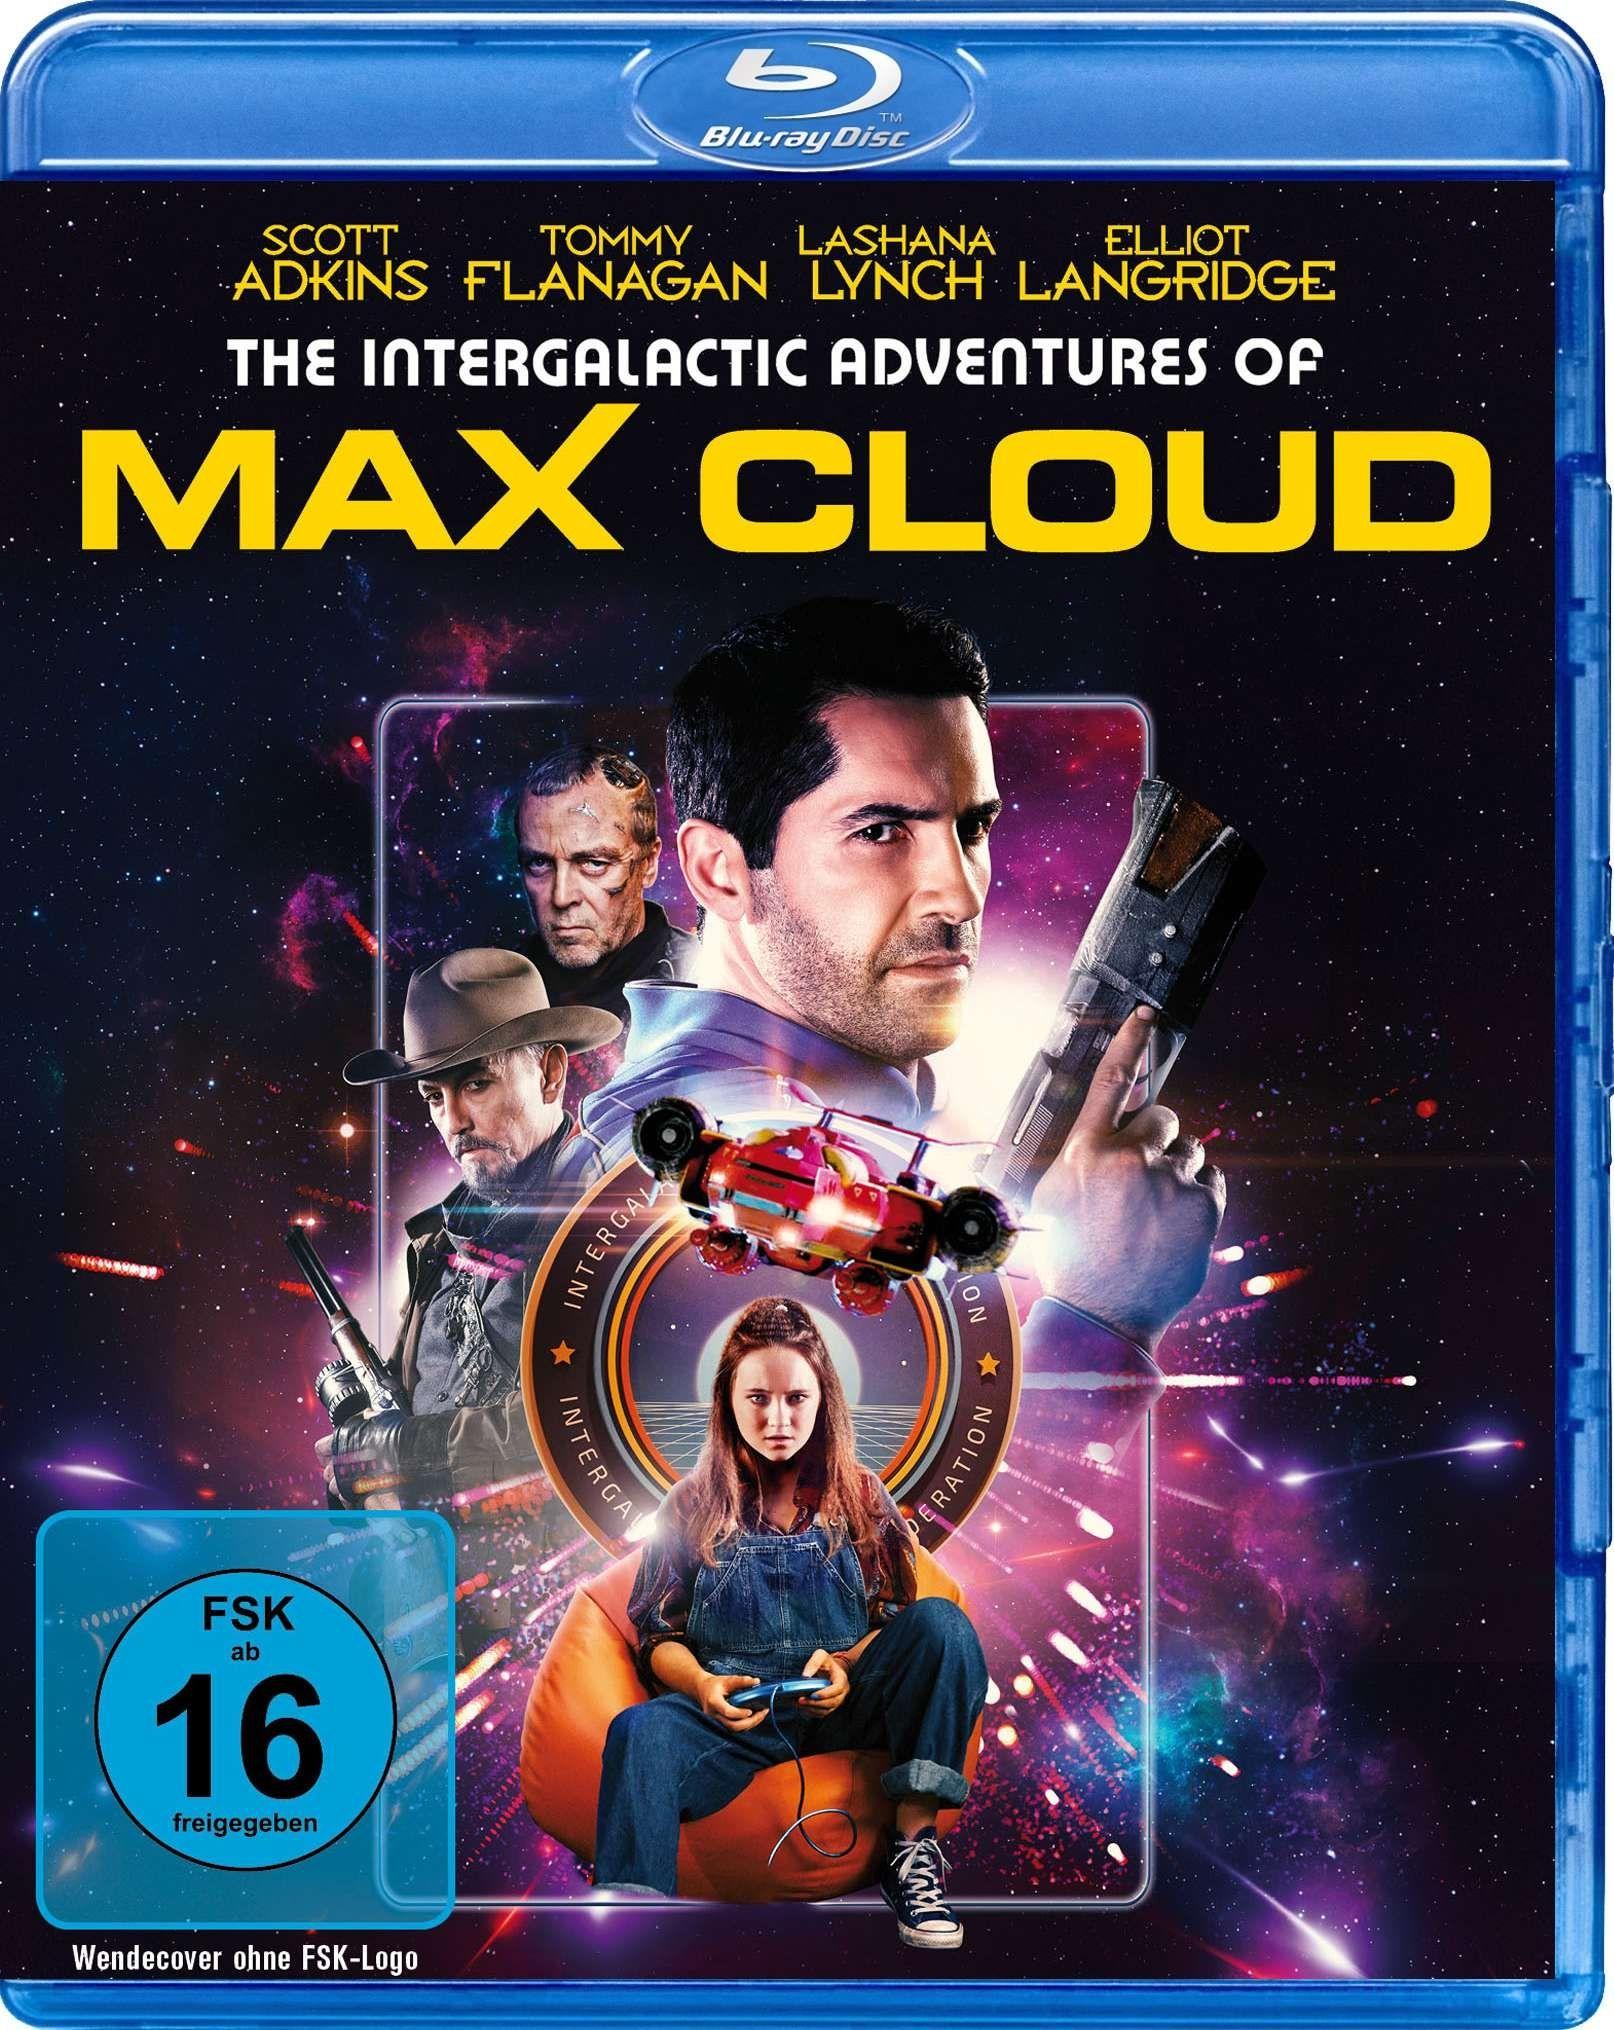 Intergalactic Adventures of Max Cloud, The (BLURAY)